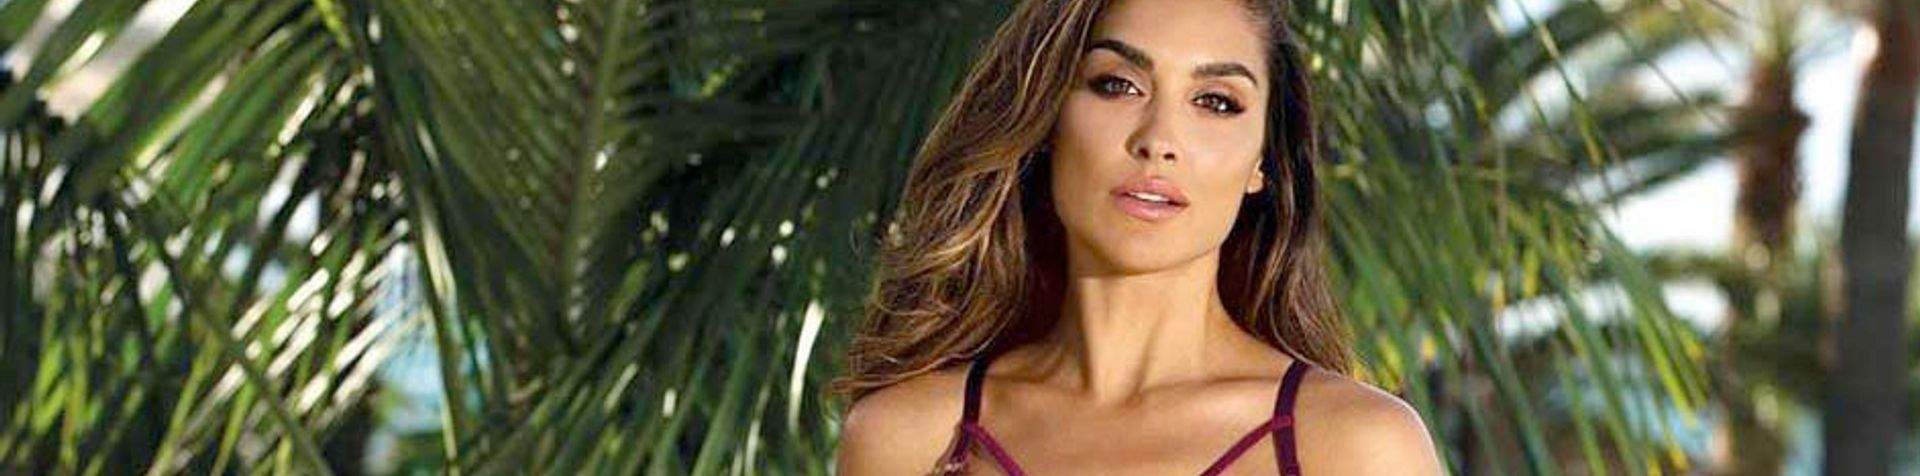 beautiful-puerto-rican-woman